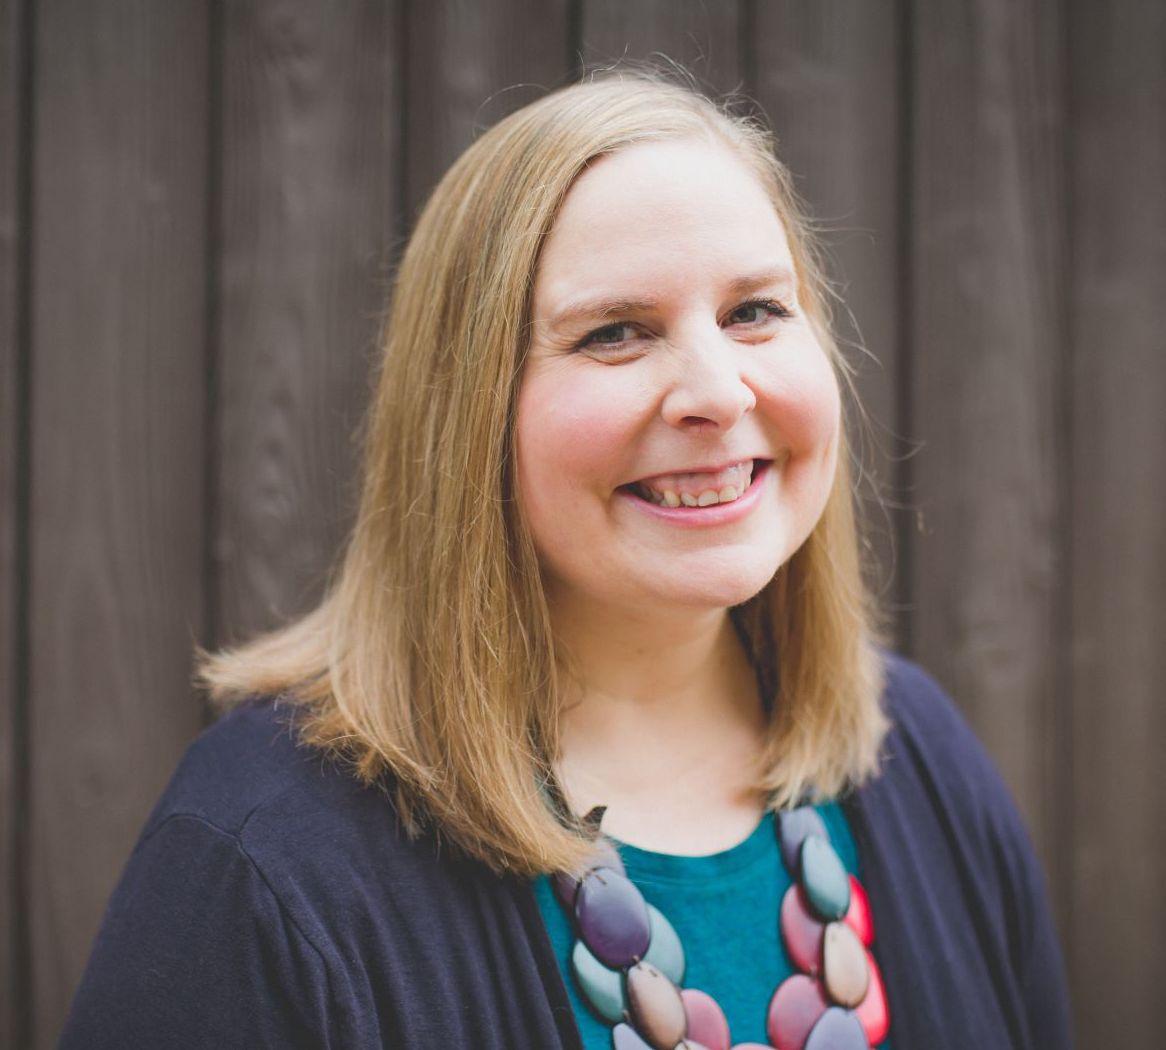 Leah-Burton-Photo-Seeds-of-Hope-Psychotherapy,-LLC.jpg